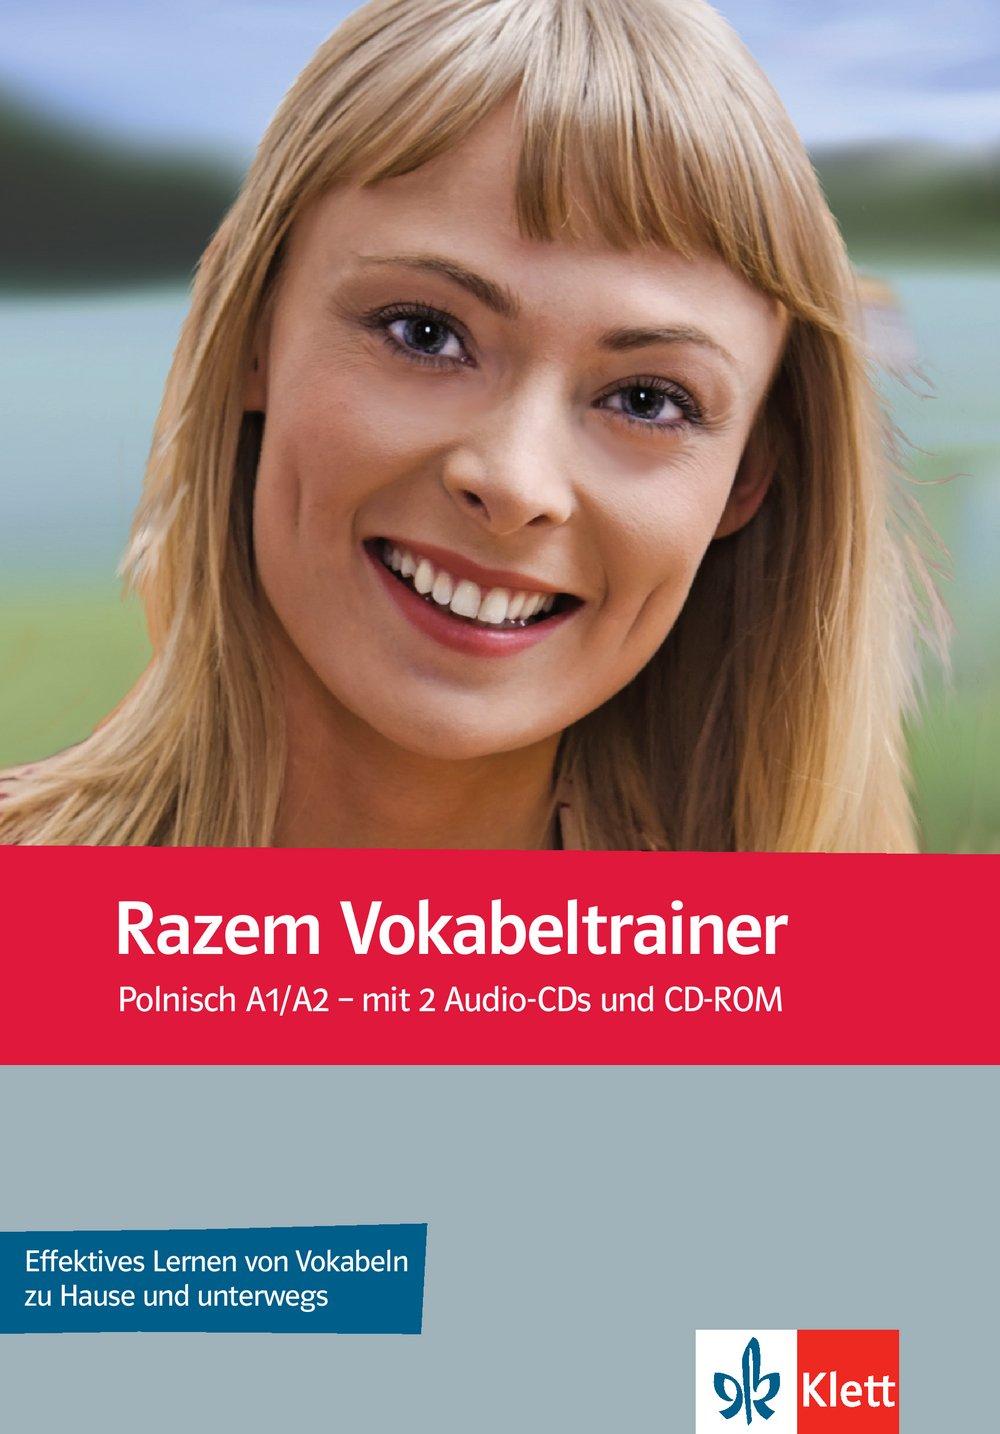 Razem A1/A2 Vokabeltrainer: Vokabelheft + 2 Audio-CDs + CD-ROM (PC/Mac) (Razem neu / Polnisch für Anfänger)